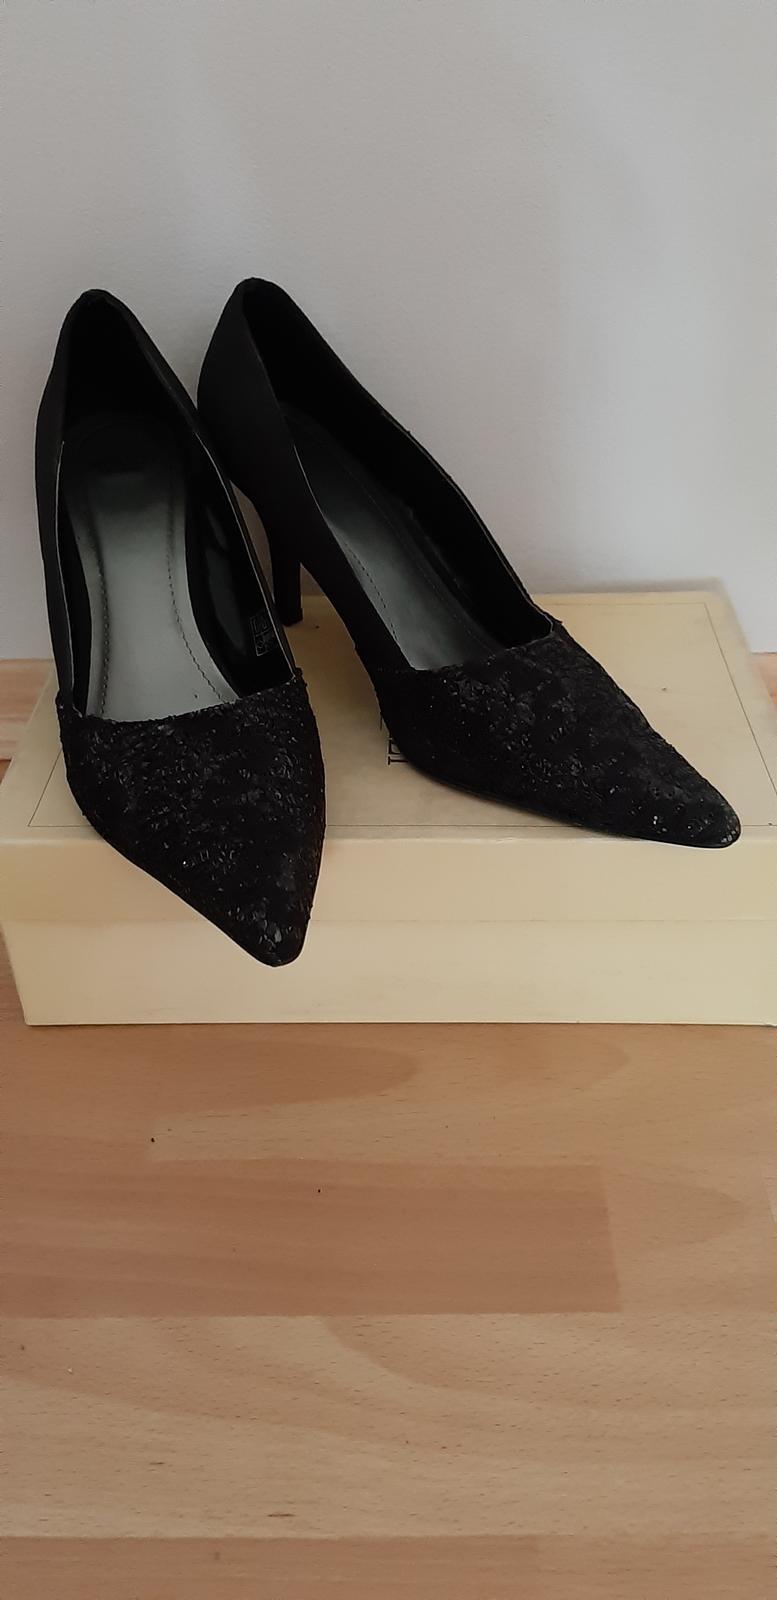 Spoločenské topánky zn. Minozzi  - Obrázok č. 1